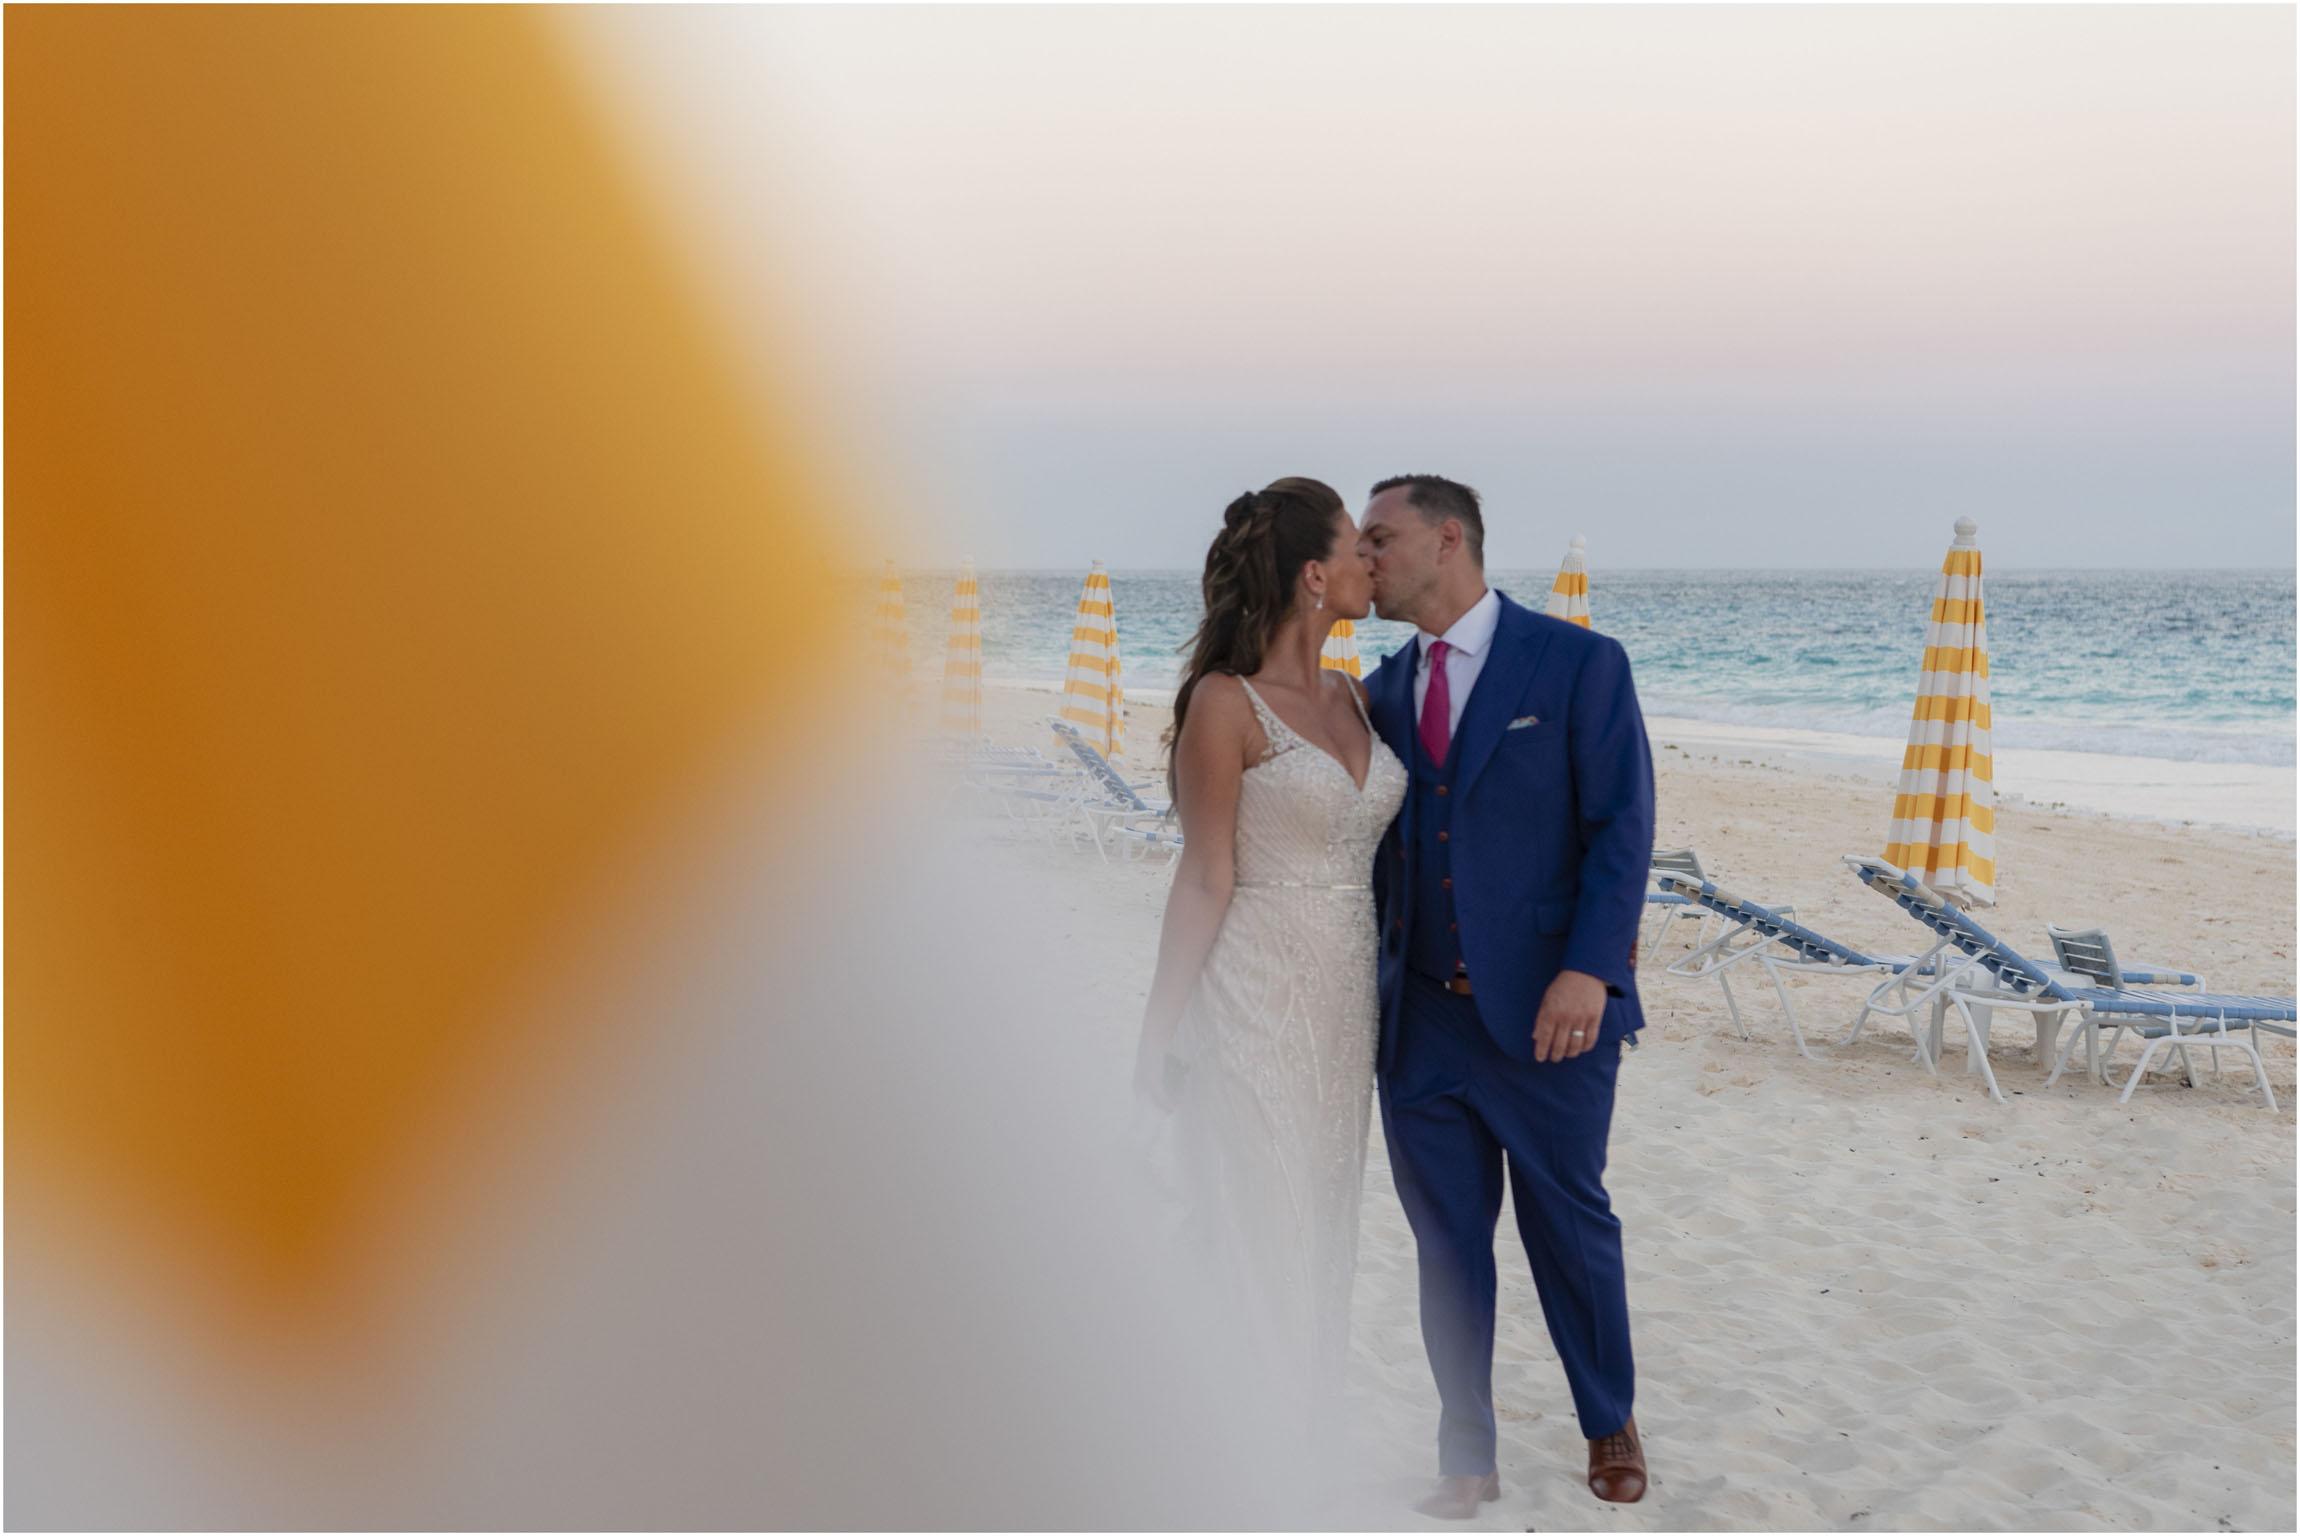 ©FianderFoto_Catherine_Kenny_Coral+Beach+Wedding_190.jpg